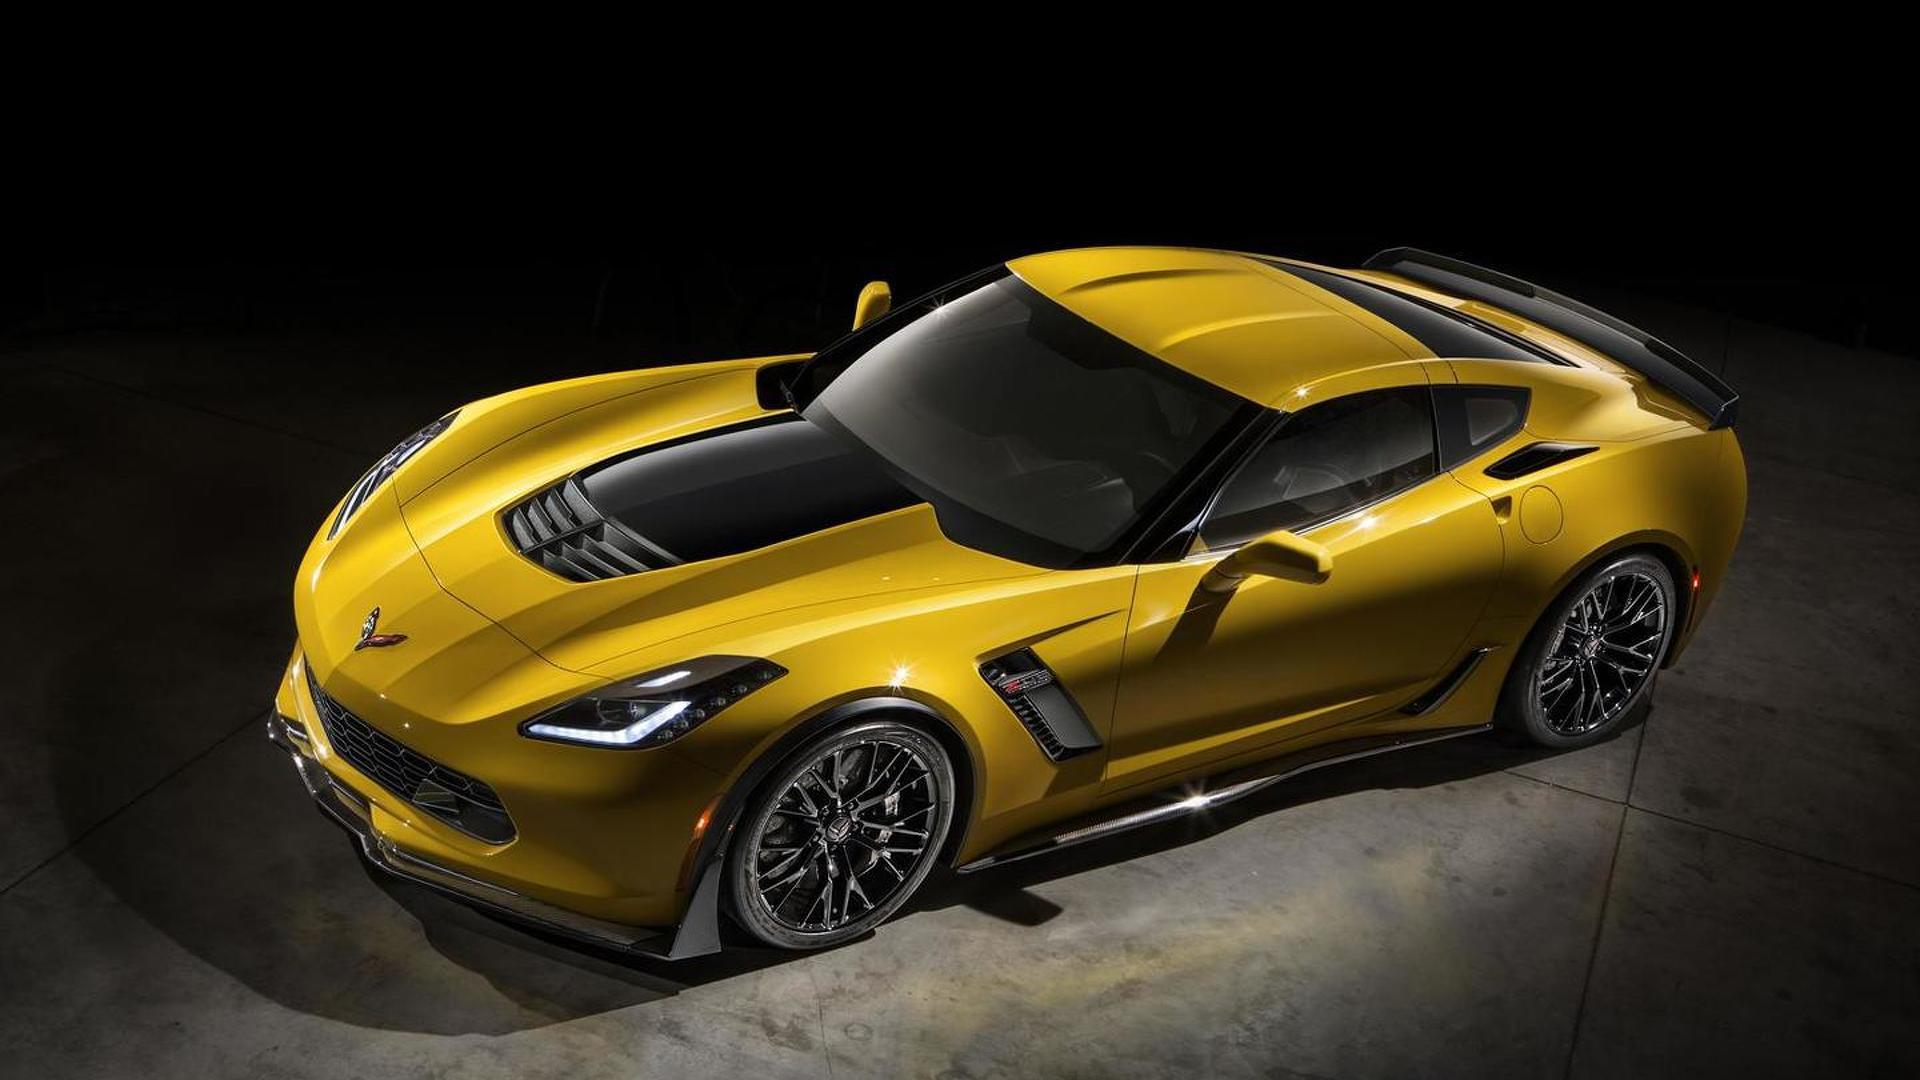 2017 corvette zora zr1 specs price autos concept - Mid Engined 2017 Chevrolet Corvette Zora Zr1 Could Be Sold Alongside C7 Hybrid Awd C8 Coming 2020